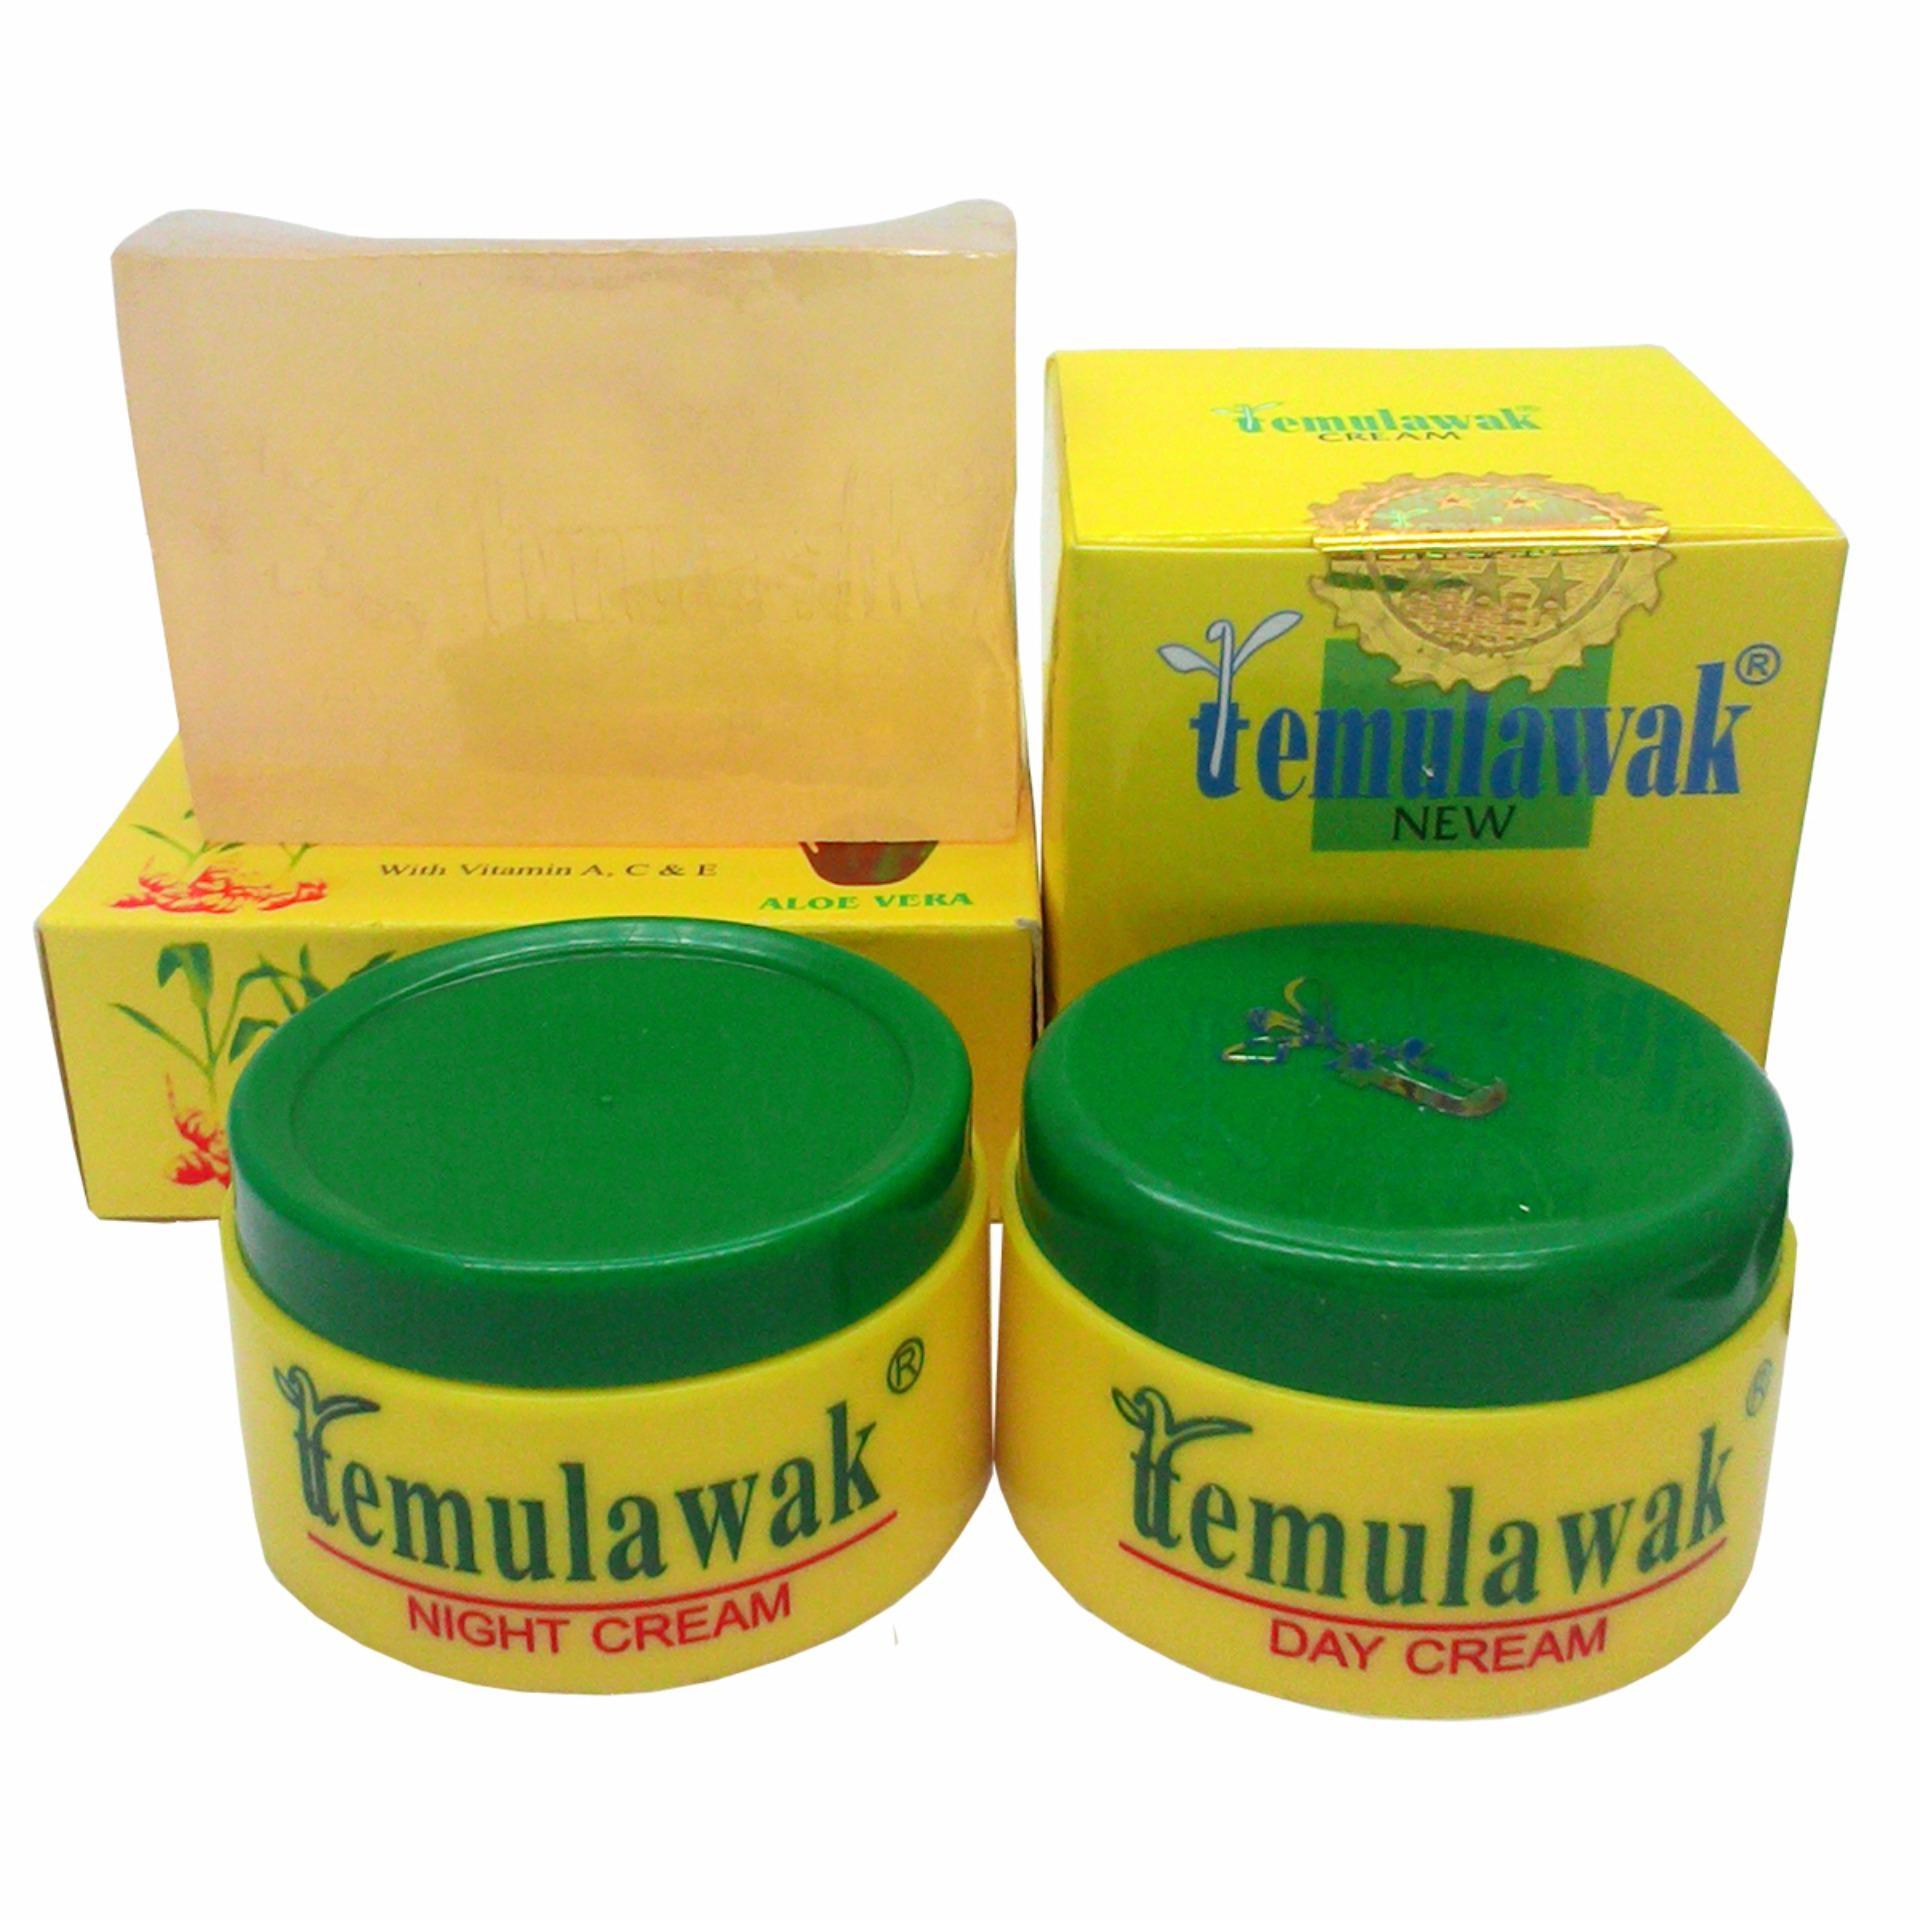 Cream Temulawak Ori - Paket Krim Temulawak Asli Hologram Gold - 1 Paket